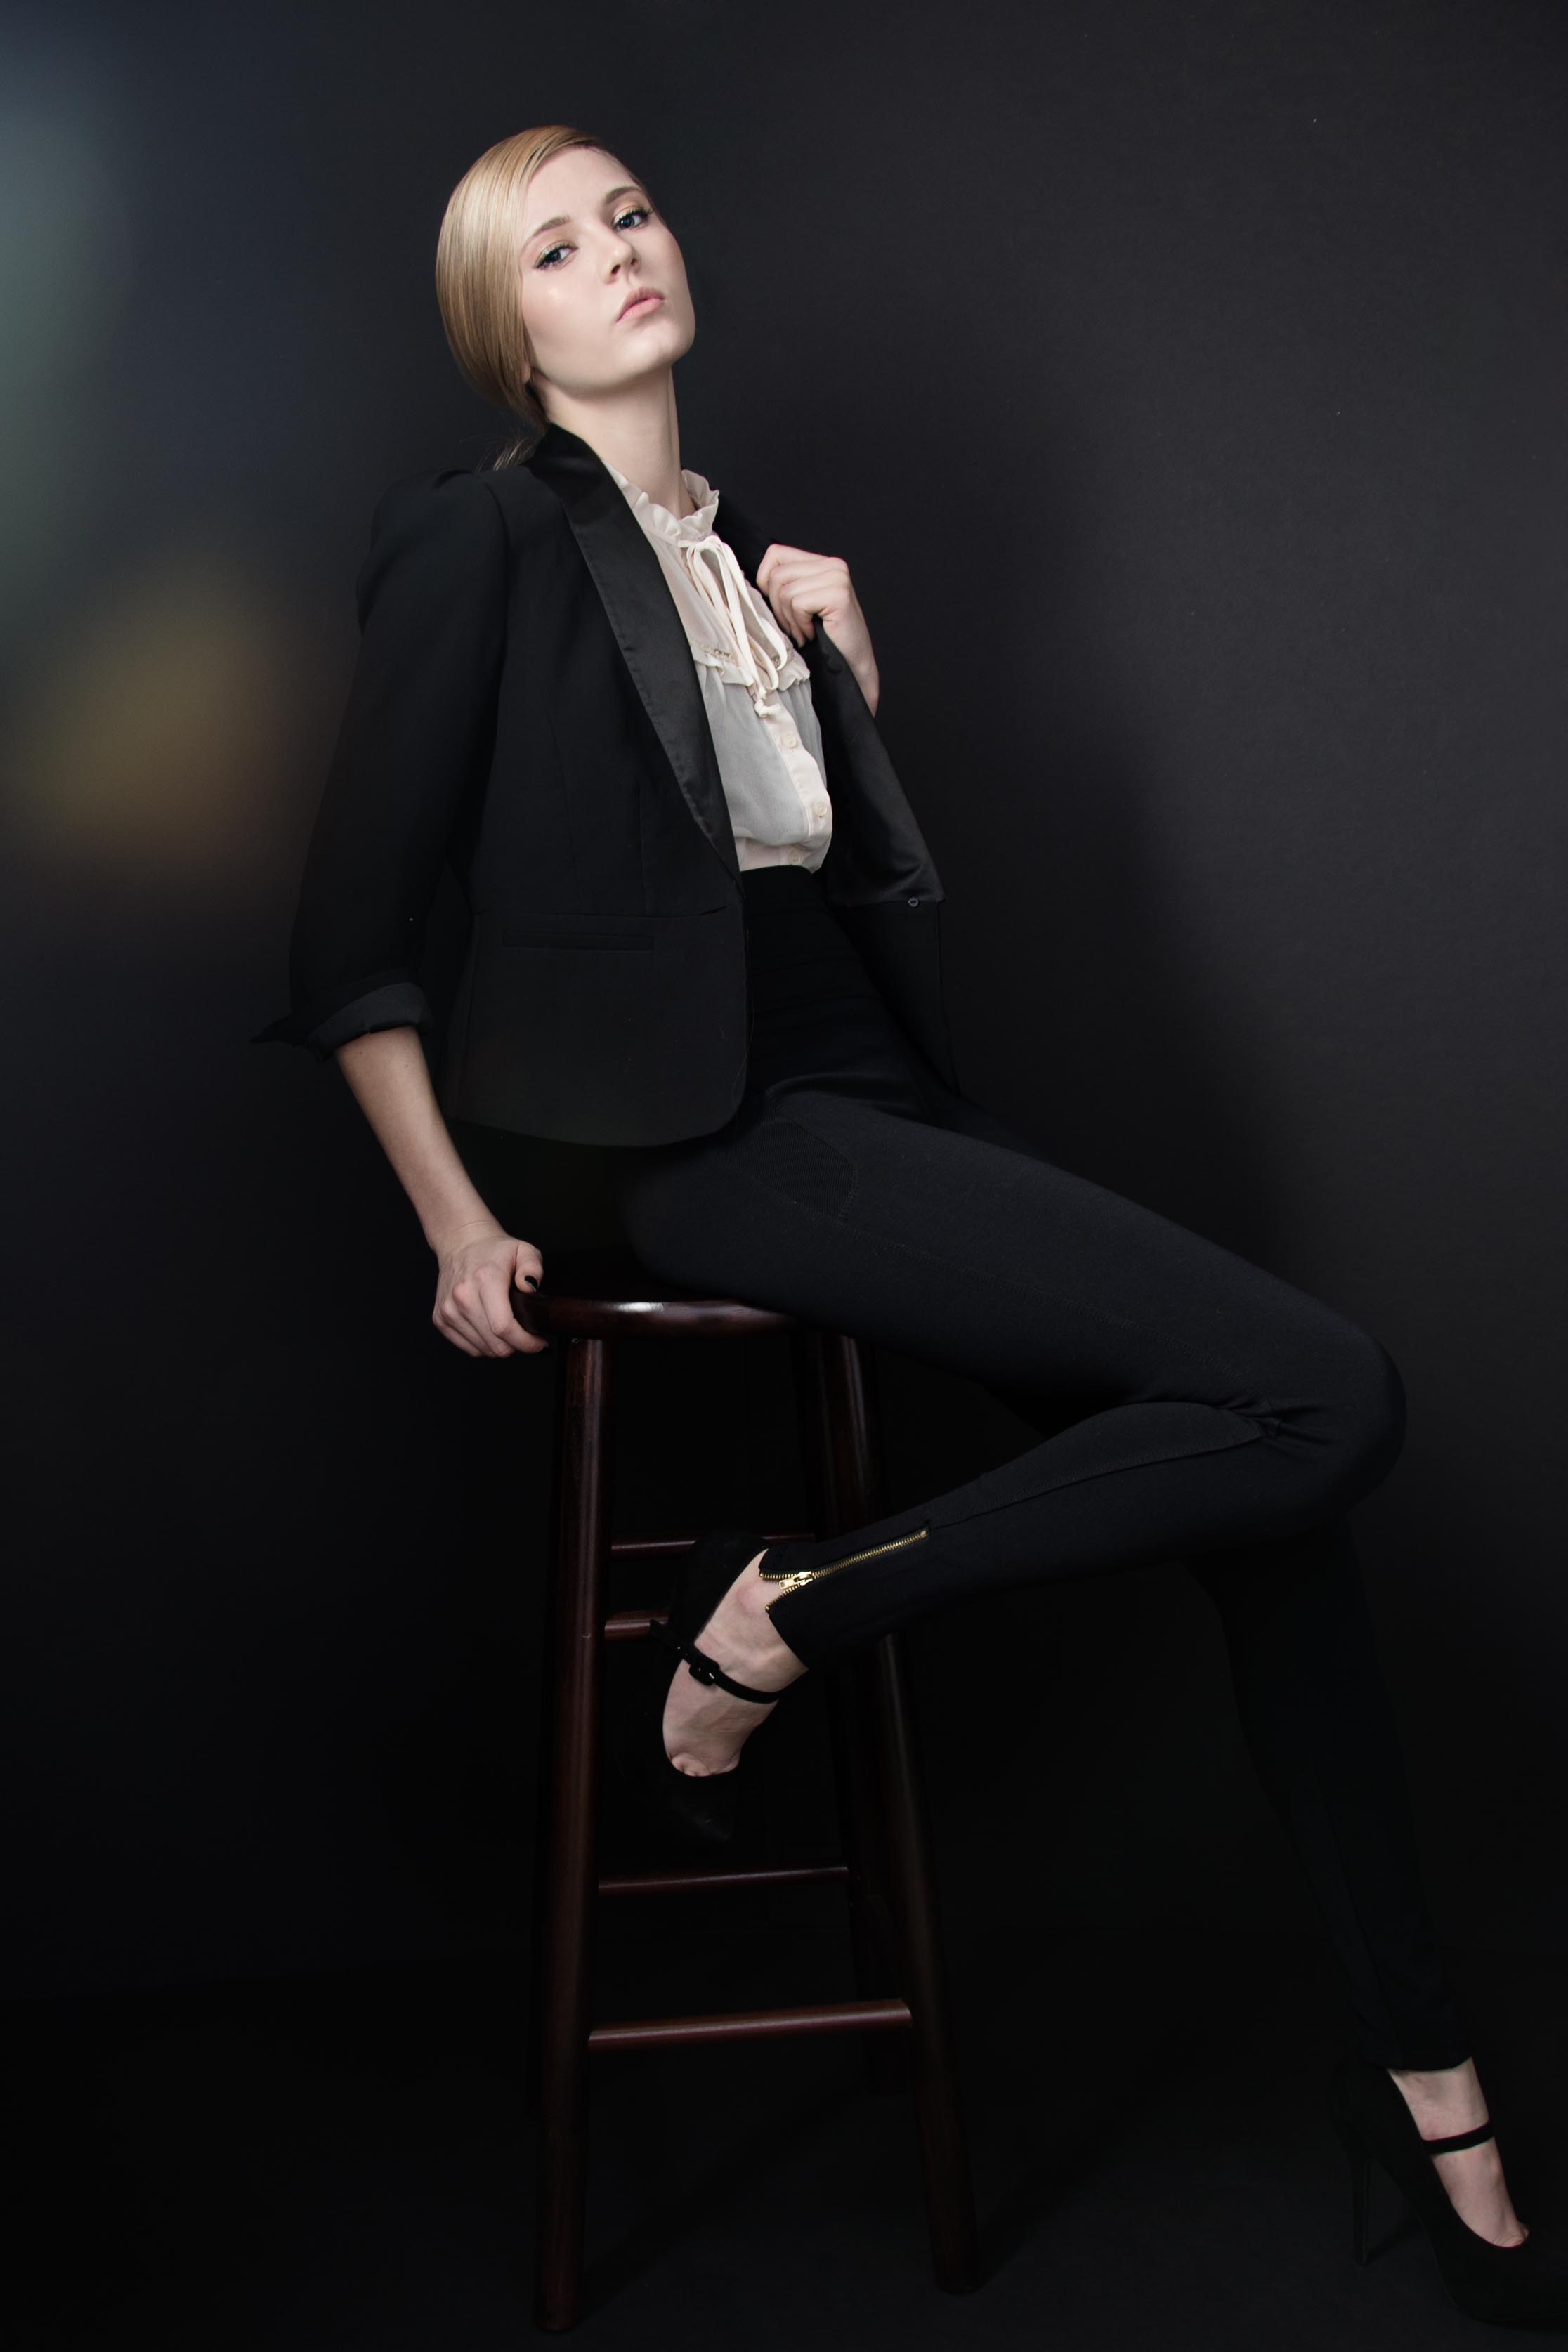 Photos in Studio Portrait photographer